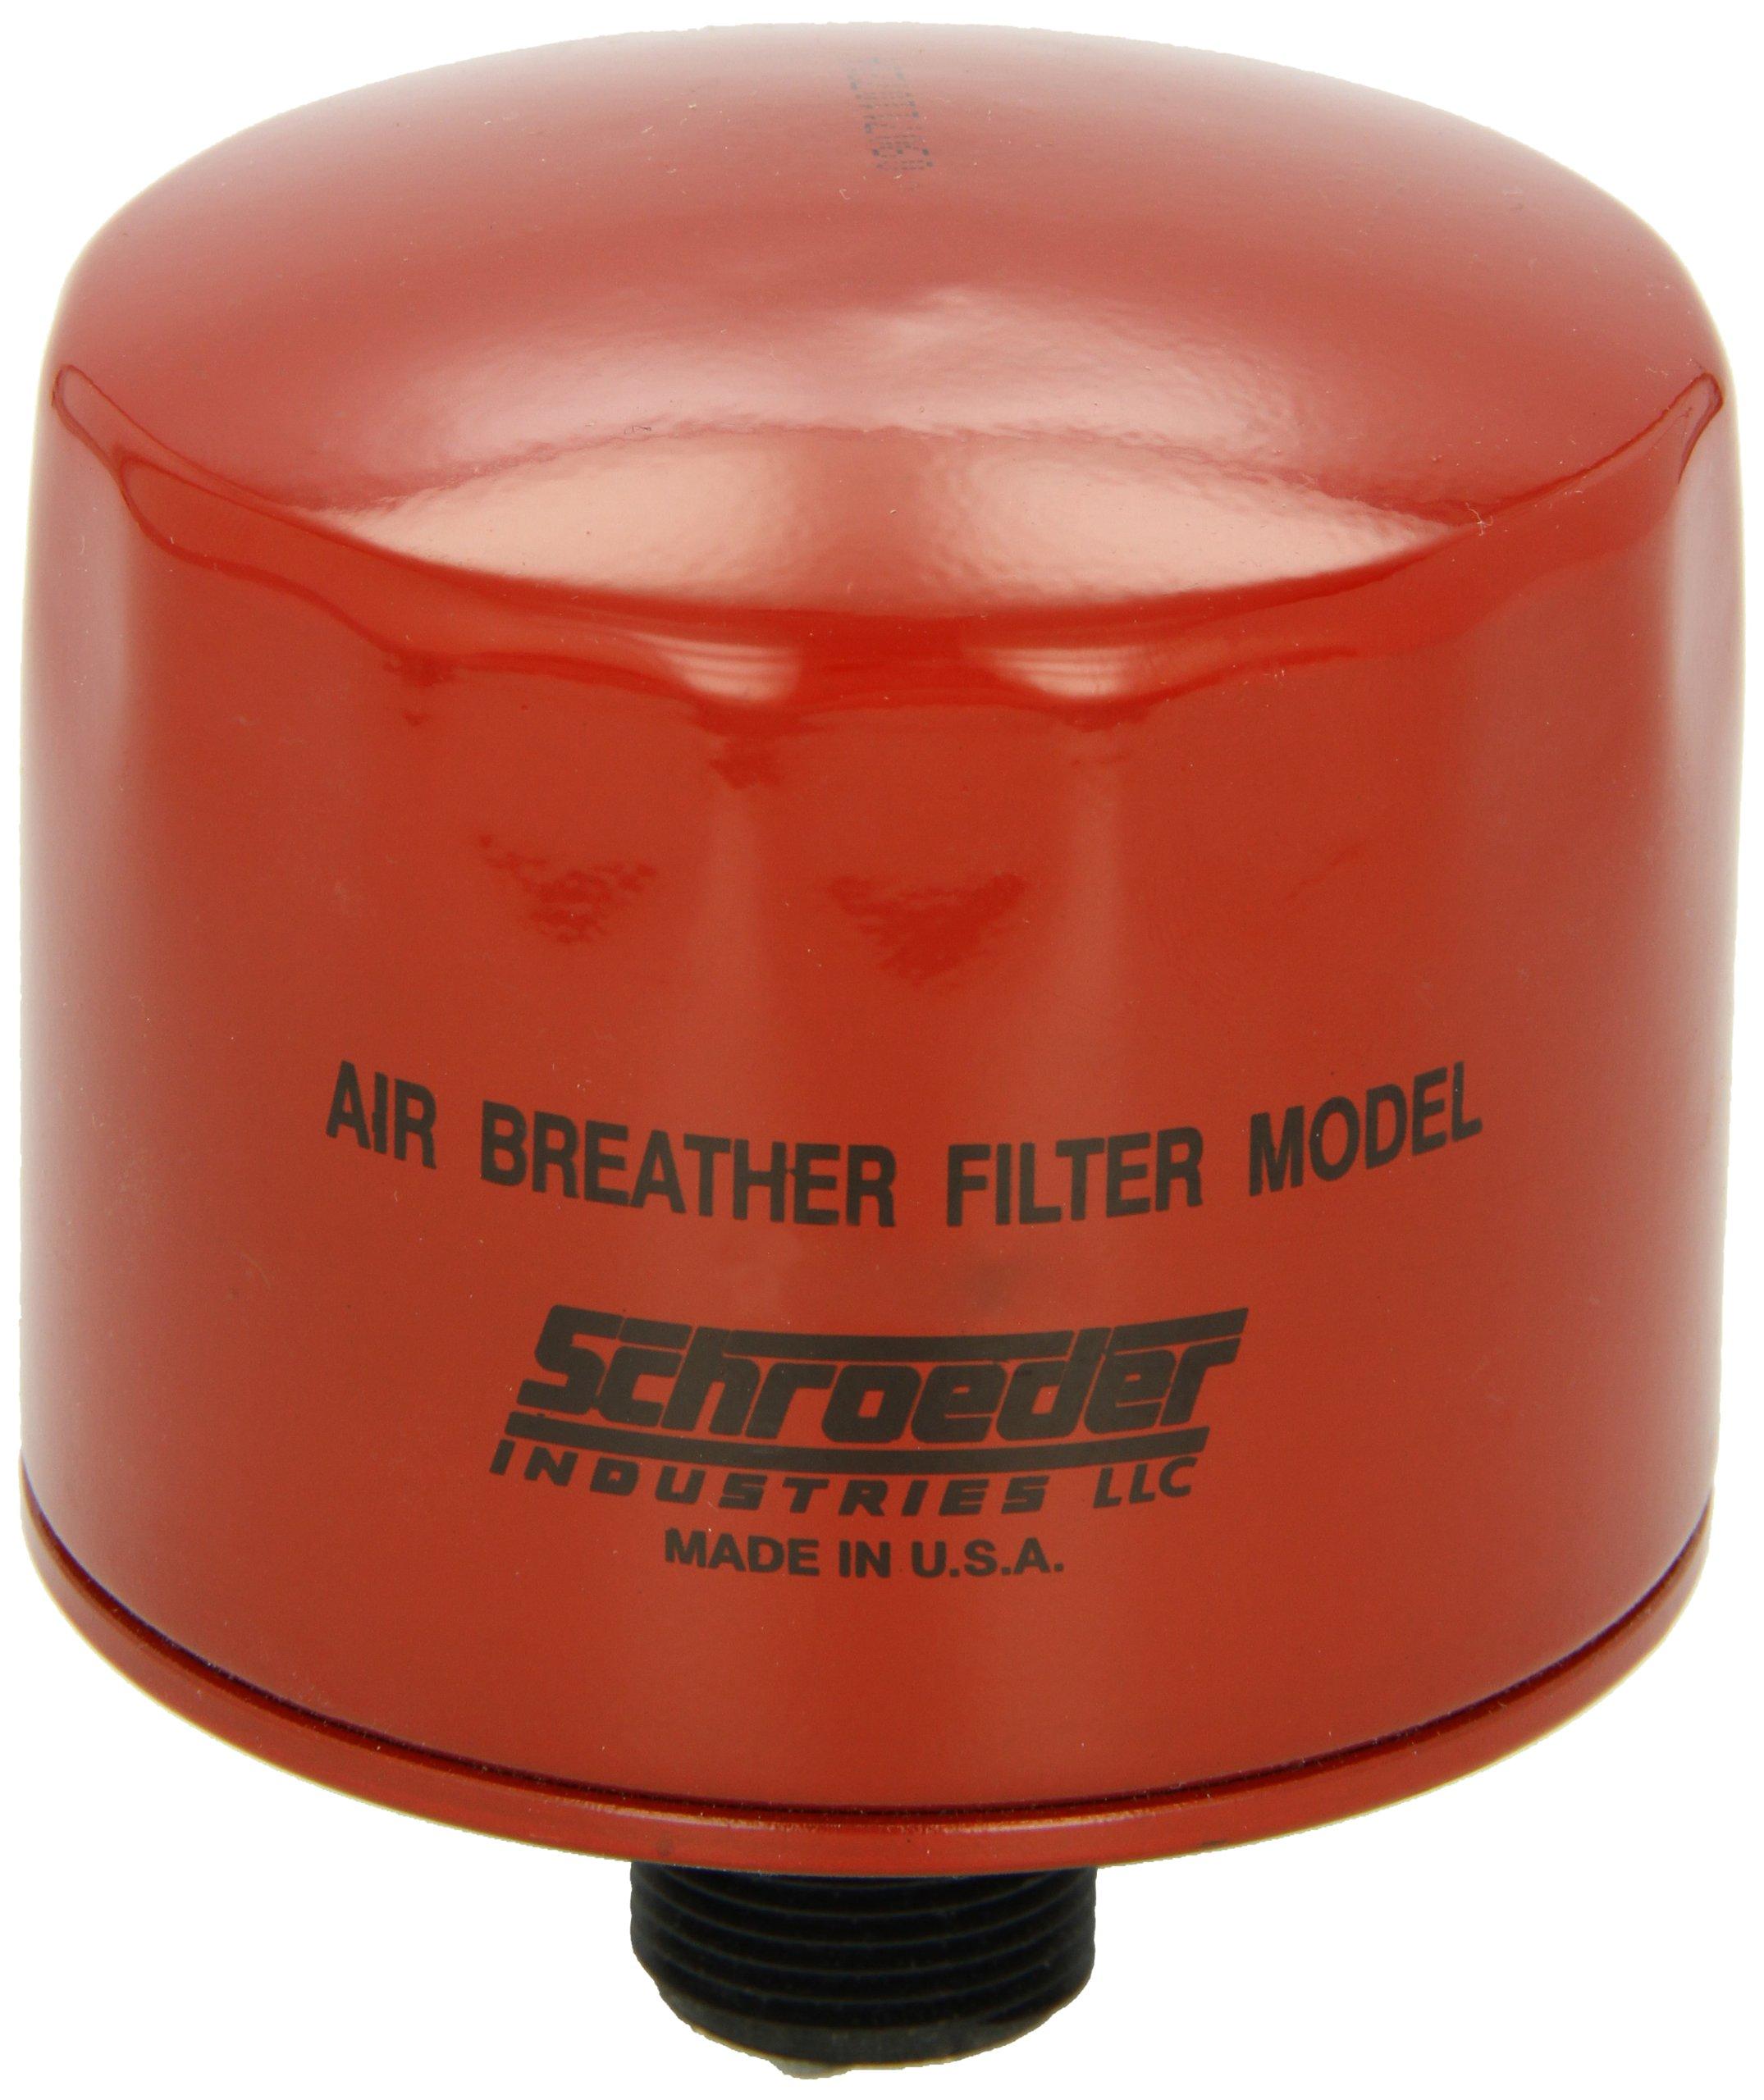 Schroeder ABF-3/10 Air Breather, Cellulose, Removes Rust, Metallic Debris, Fibers, Dirt; 40 scfm, 10 Micron